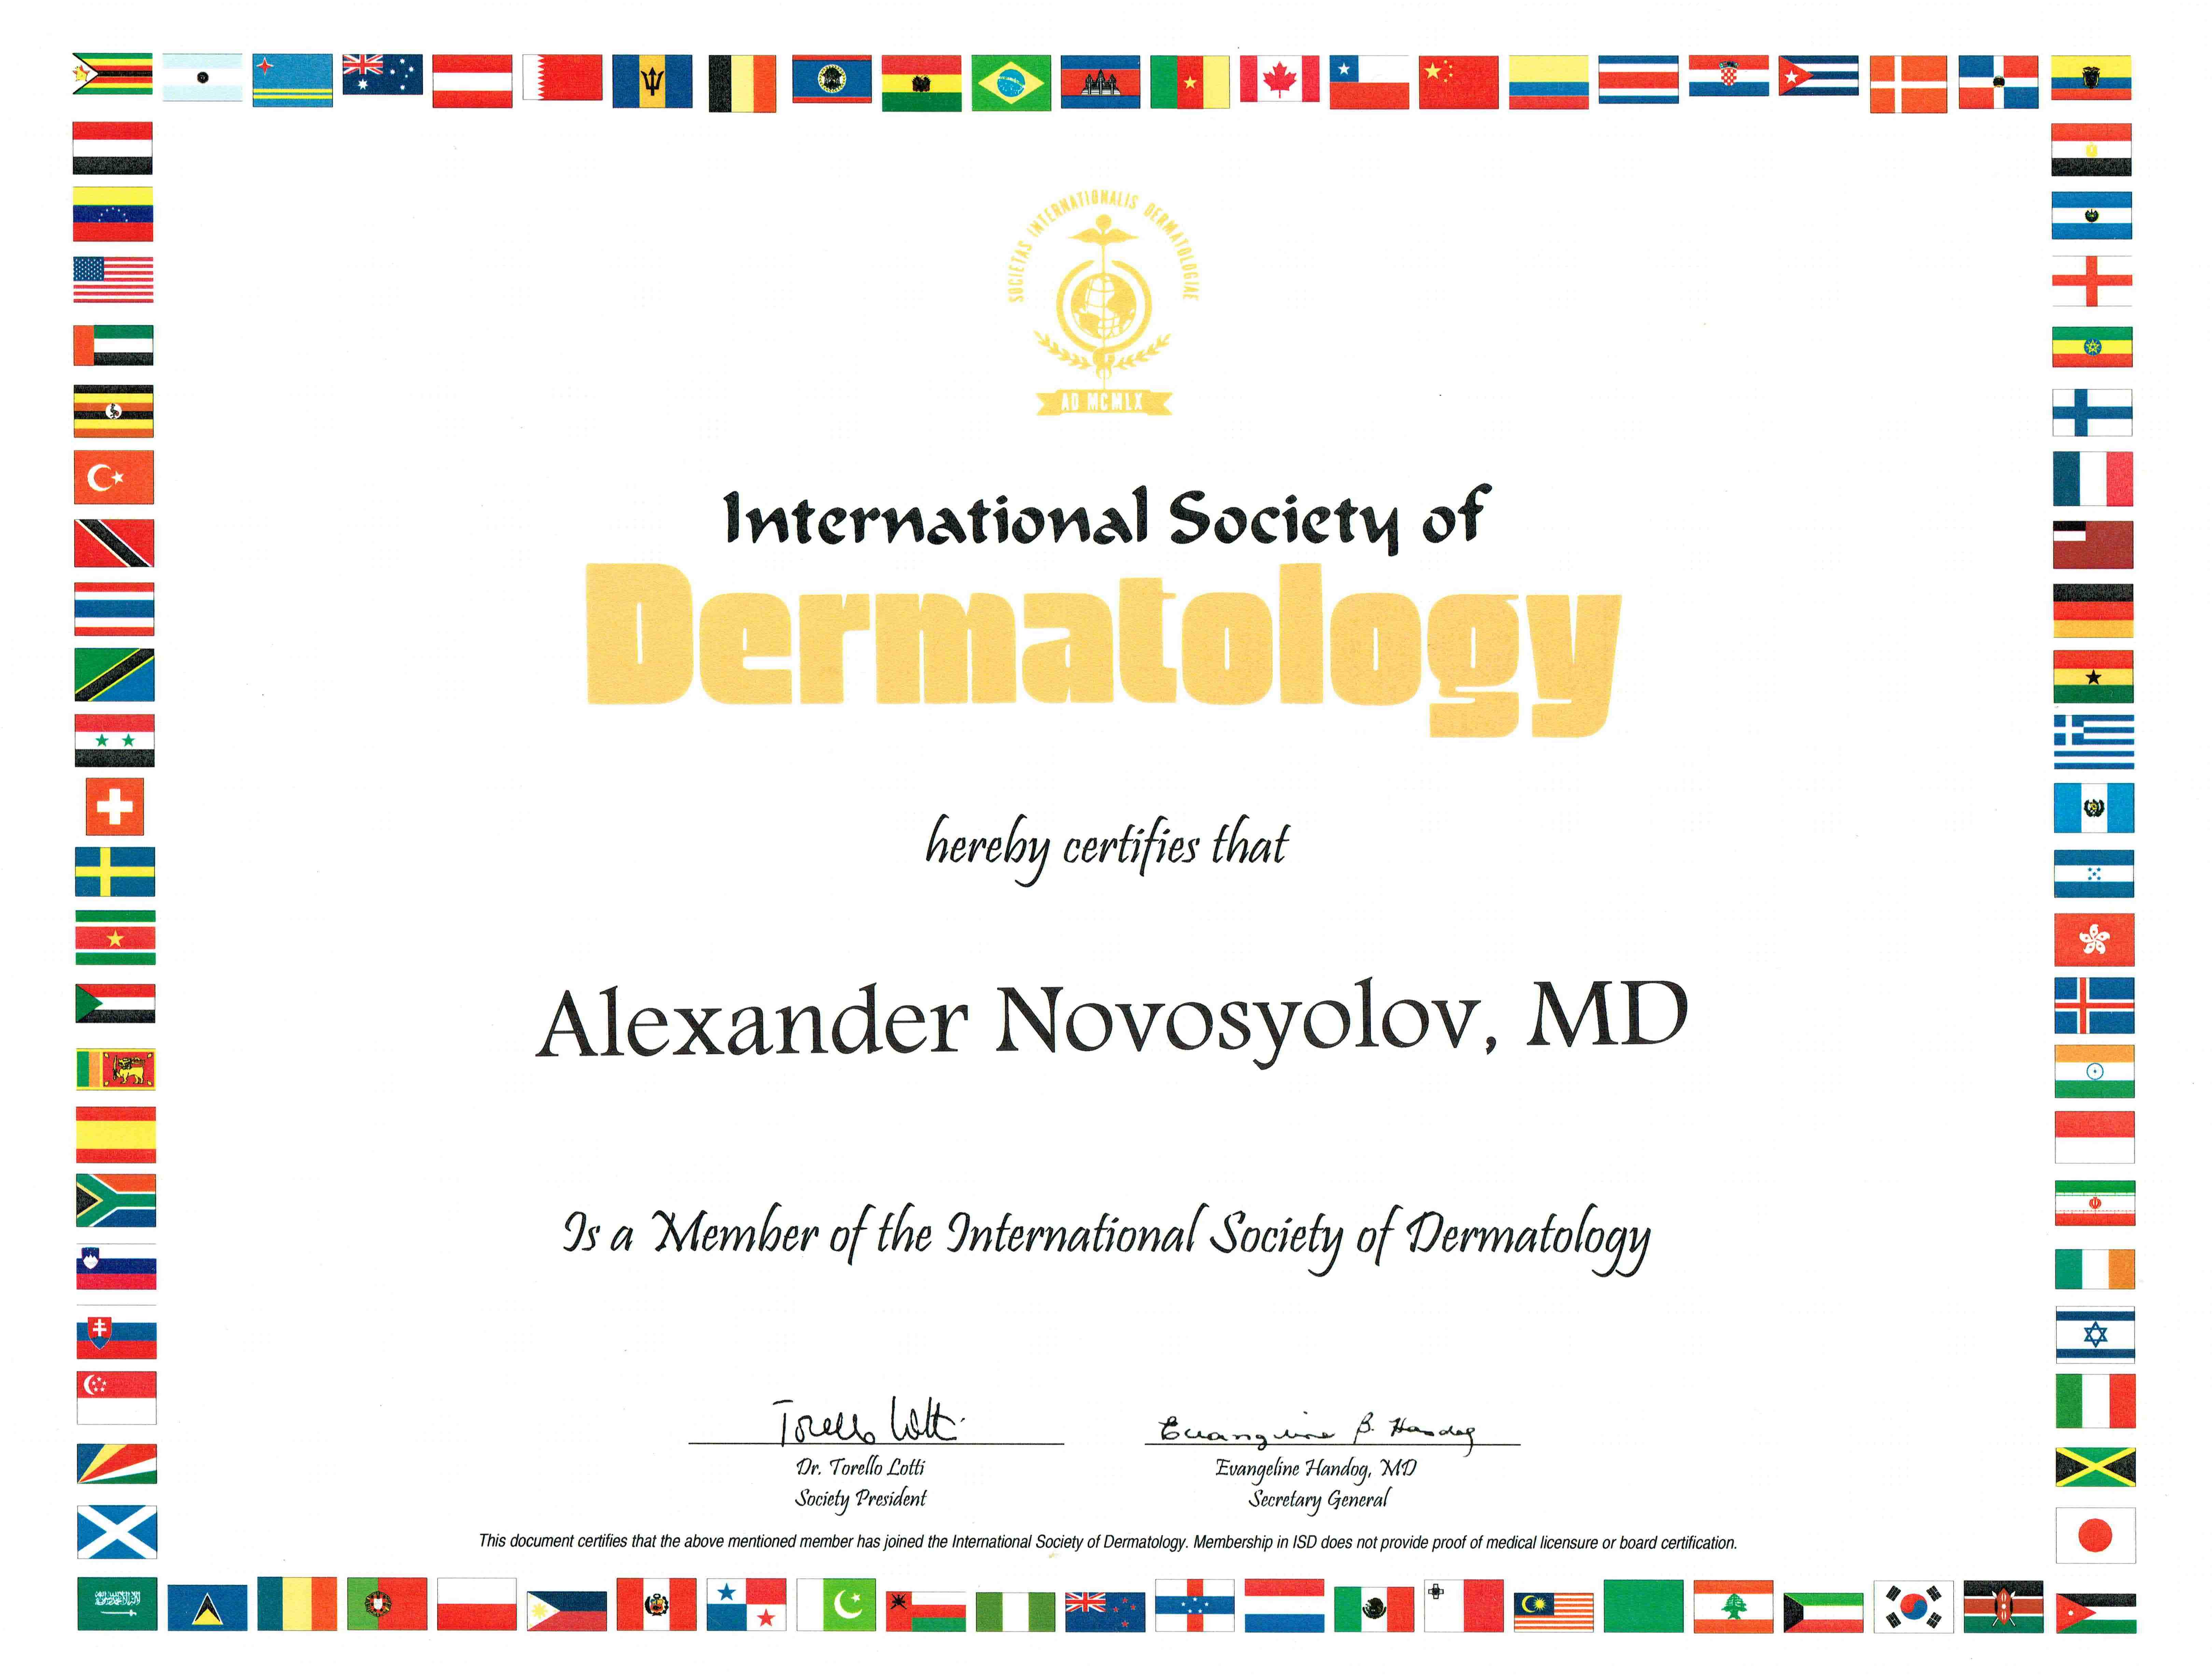 Member of the ISD